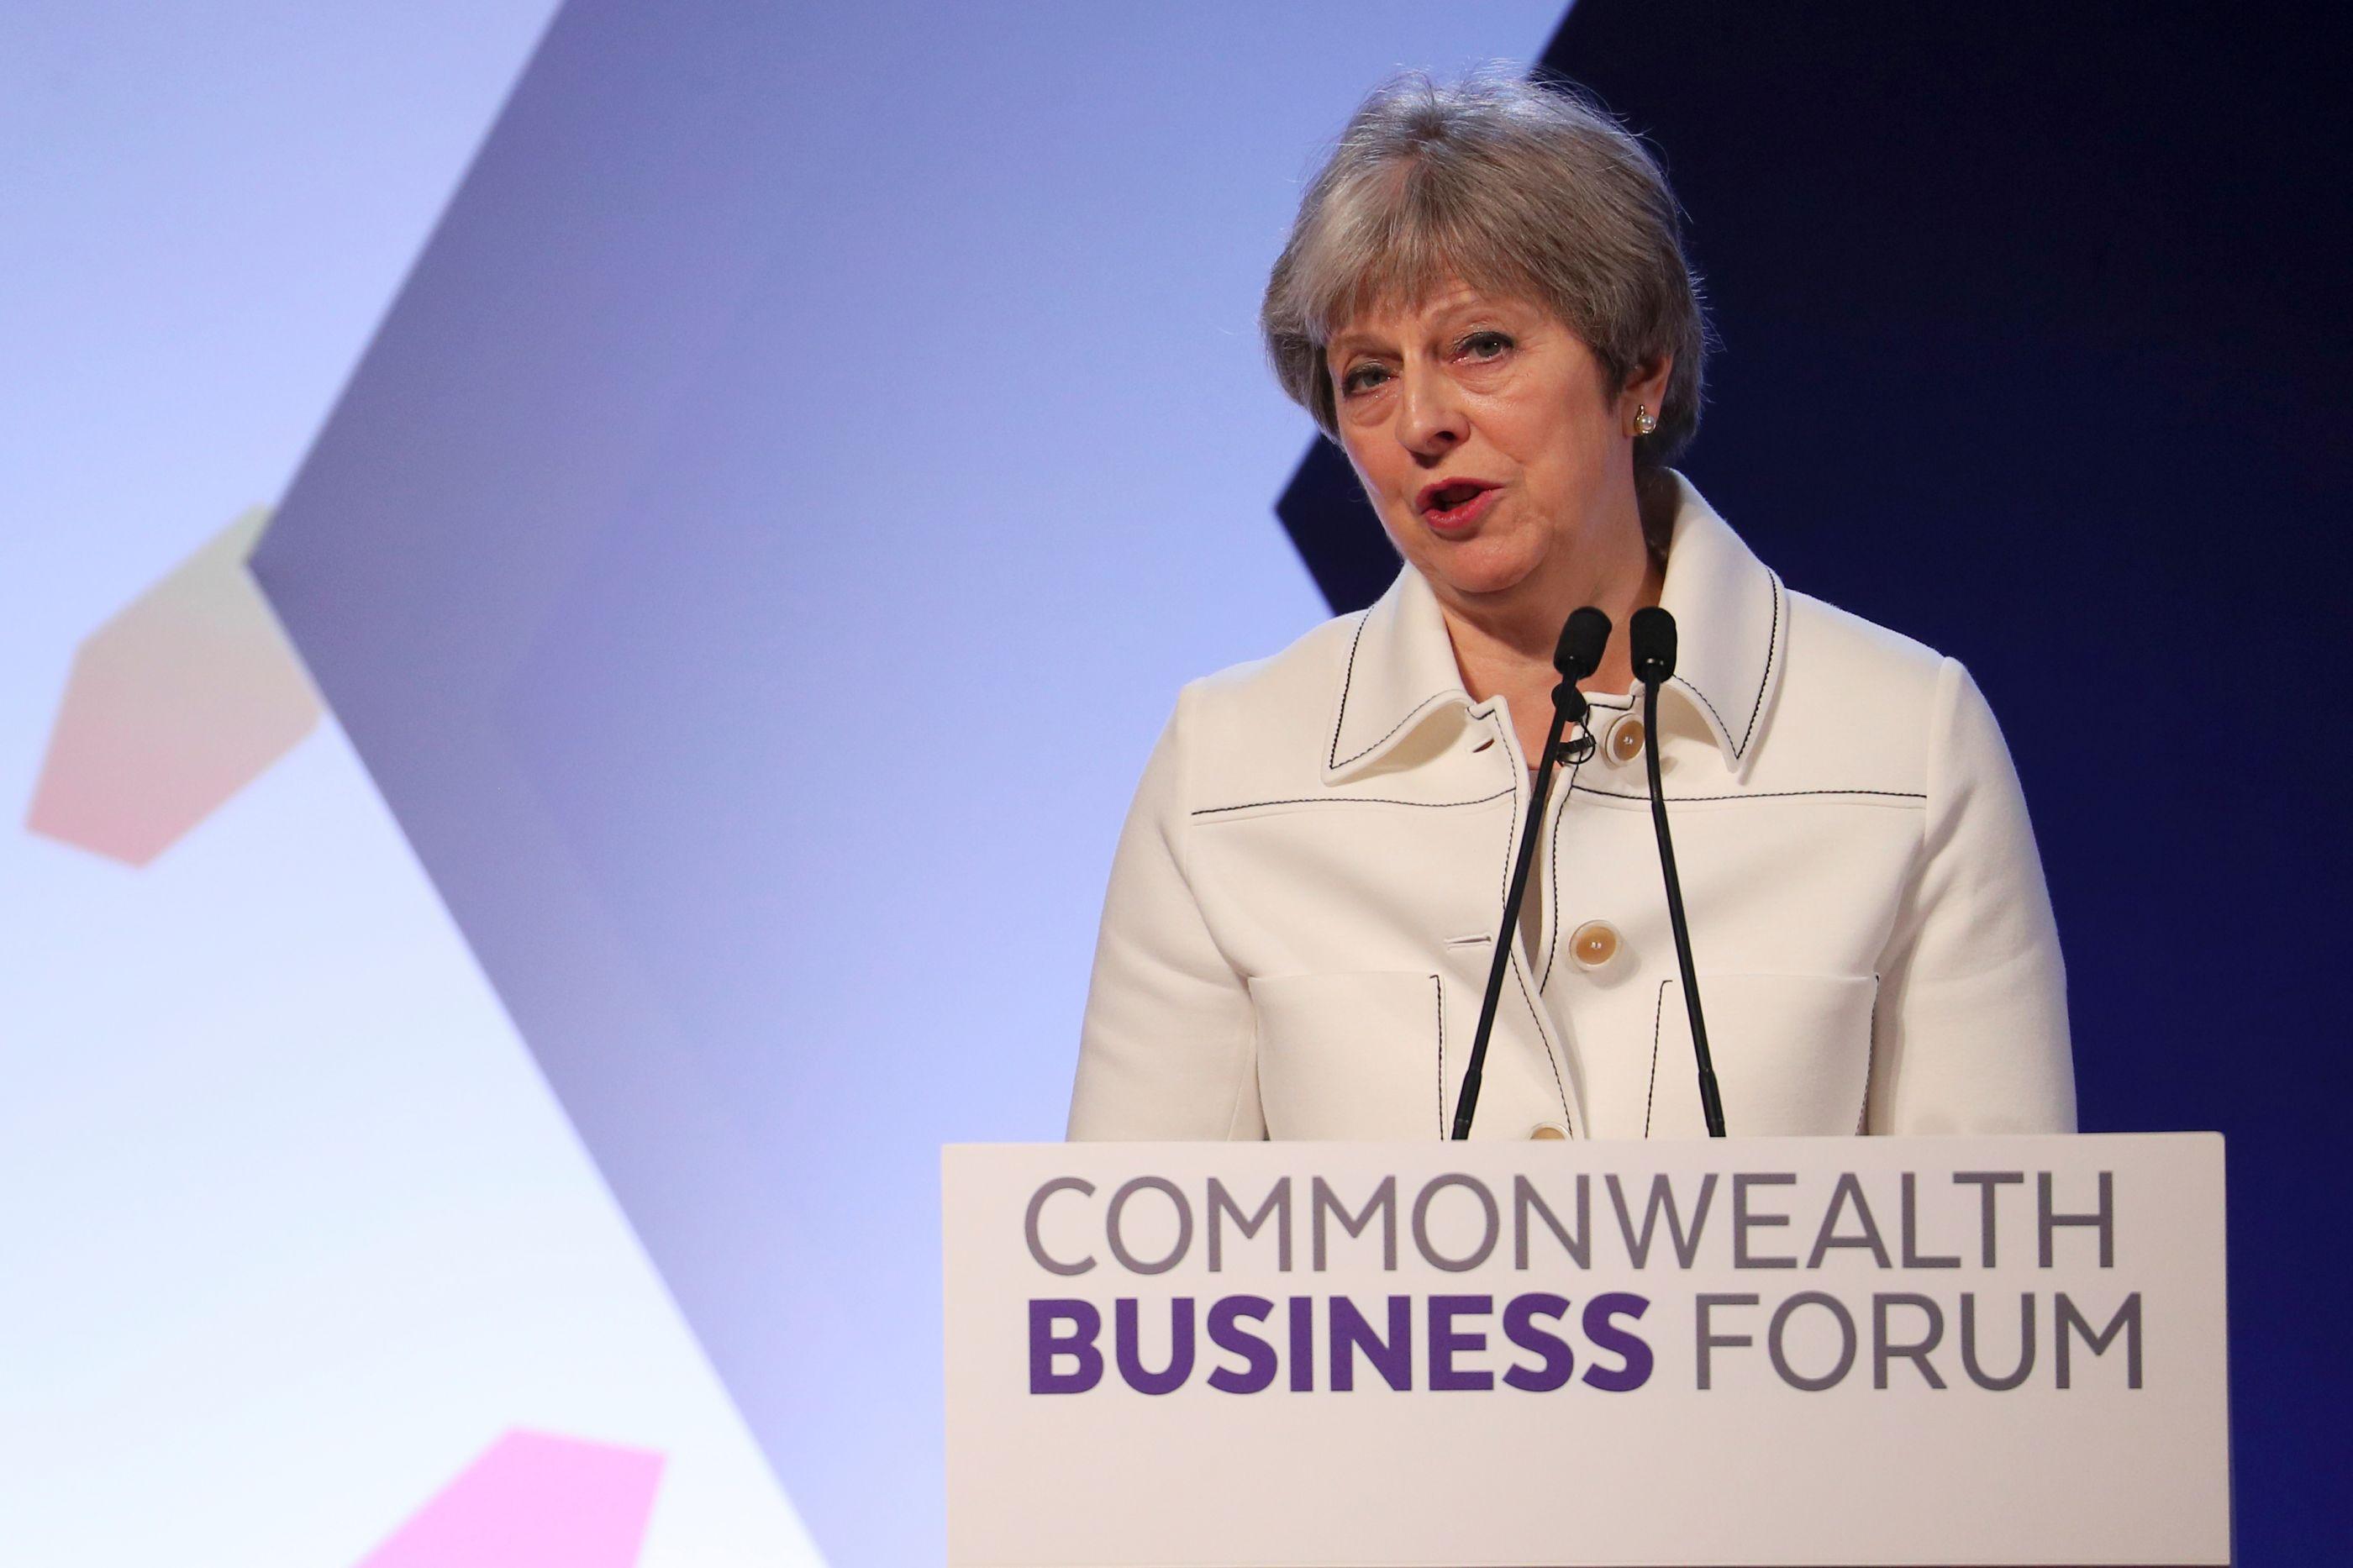 Reino Unido financia programas para facilitar comércio livre